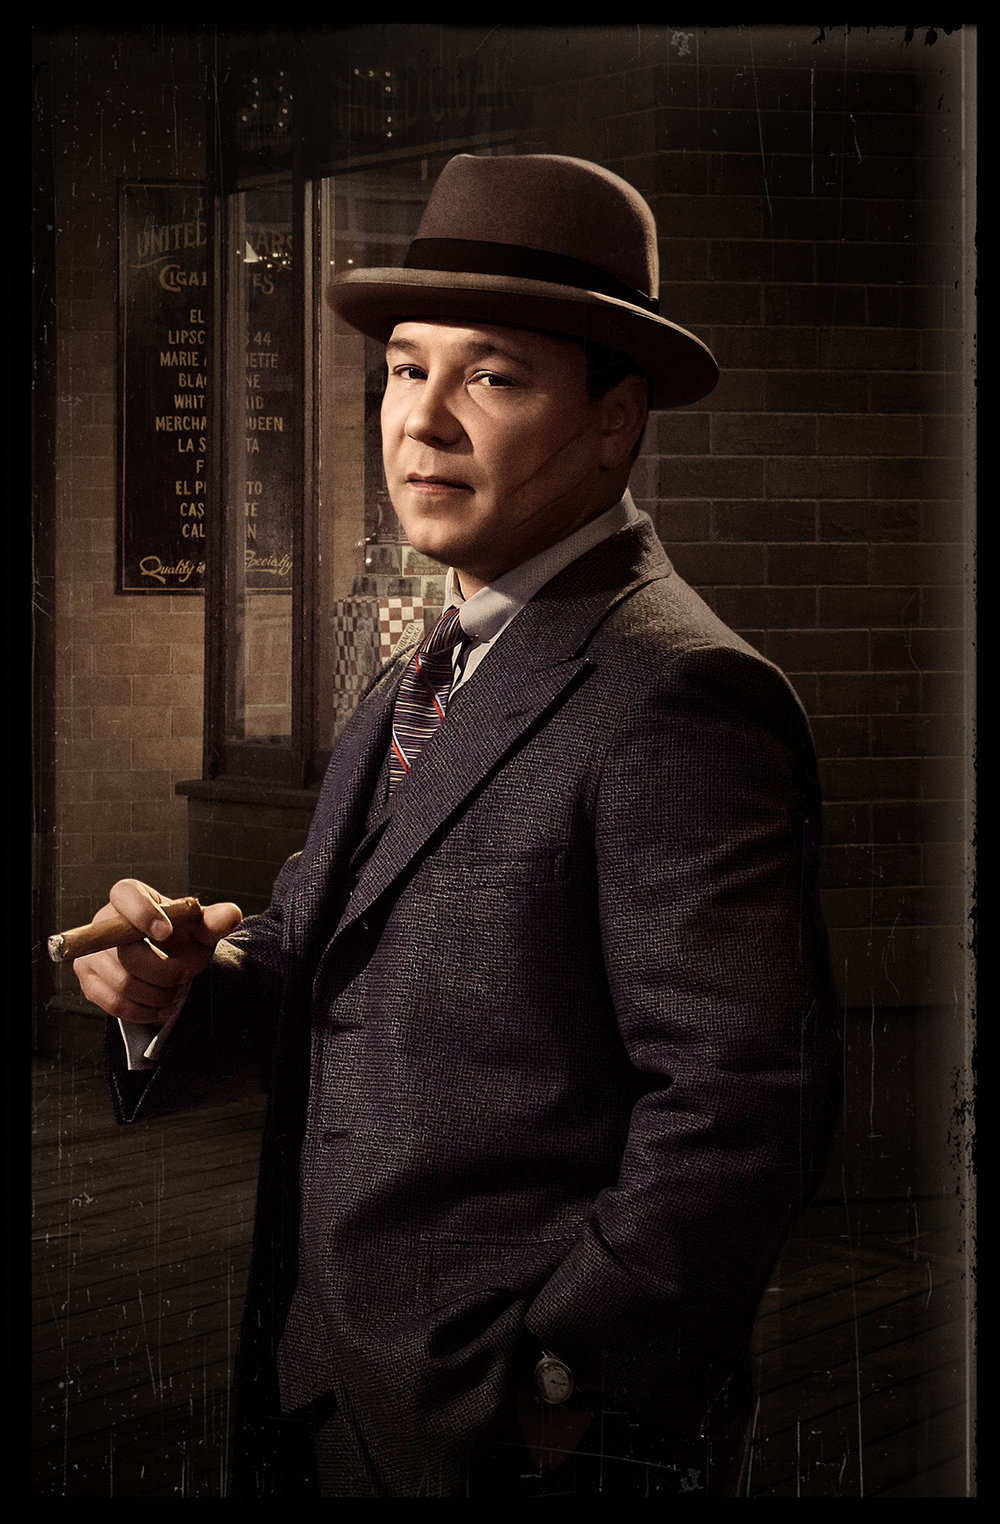 HBO - Boardwalk Empire - Stephen Graham as Al Capone - Brooklyn, NY